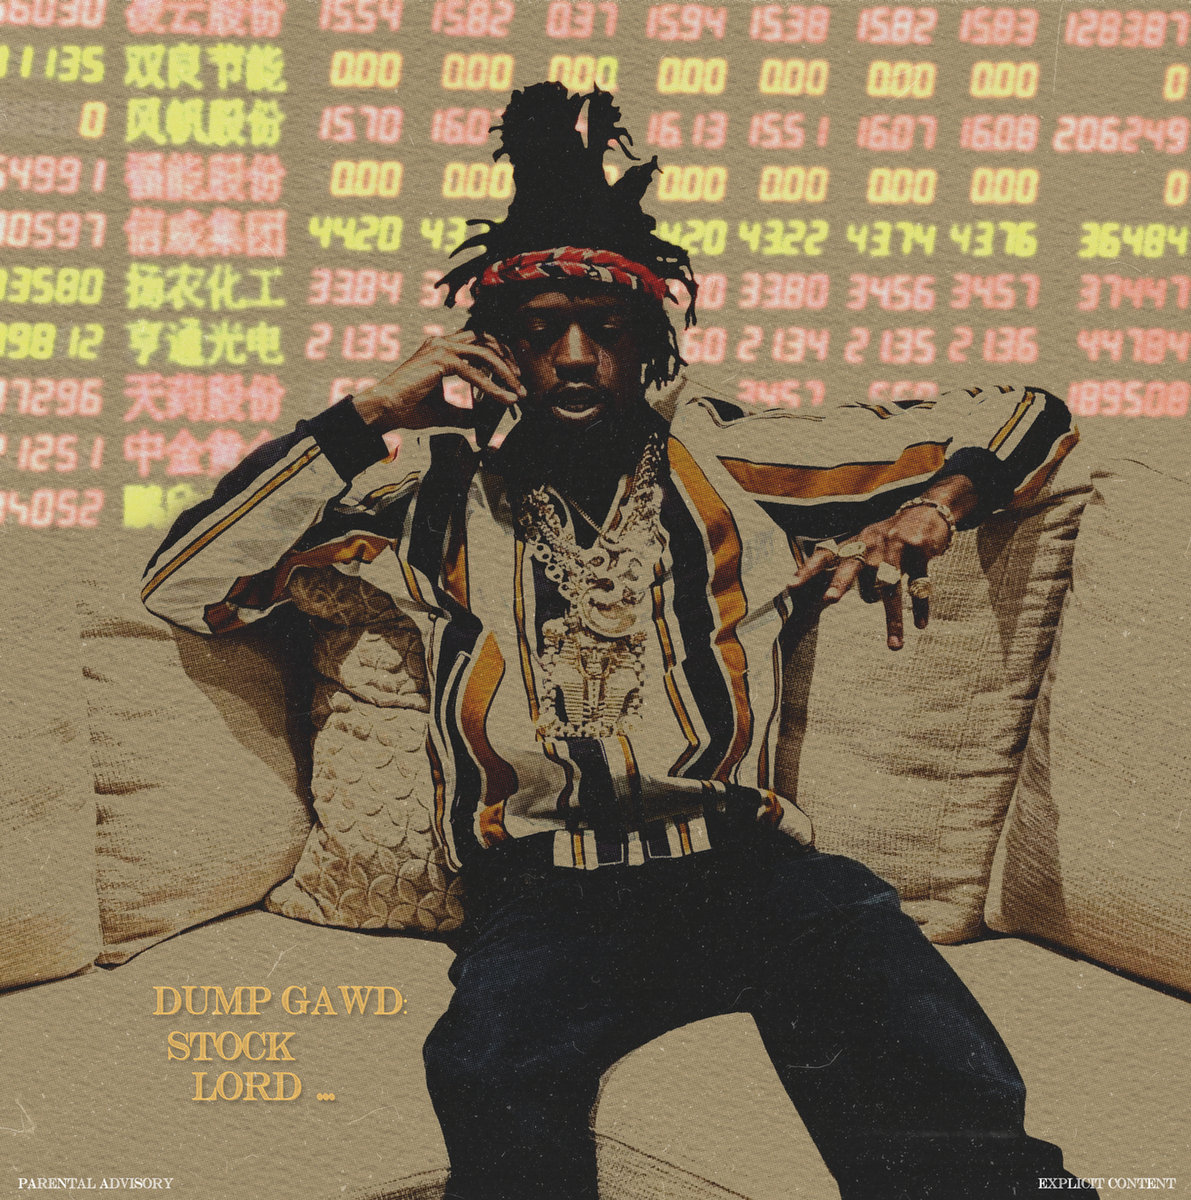 Tha God Fahim - Dump Gawd: Stock Lord LP